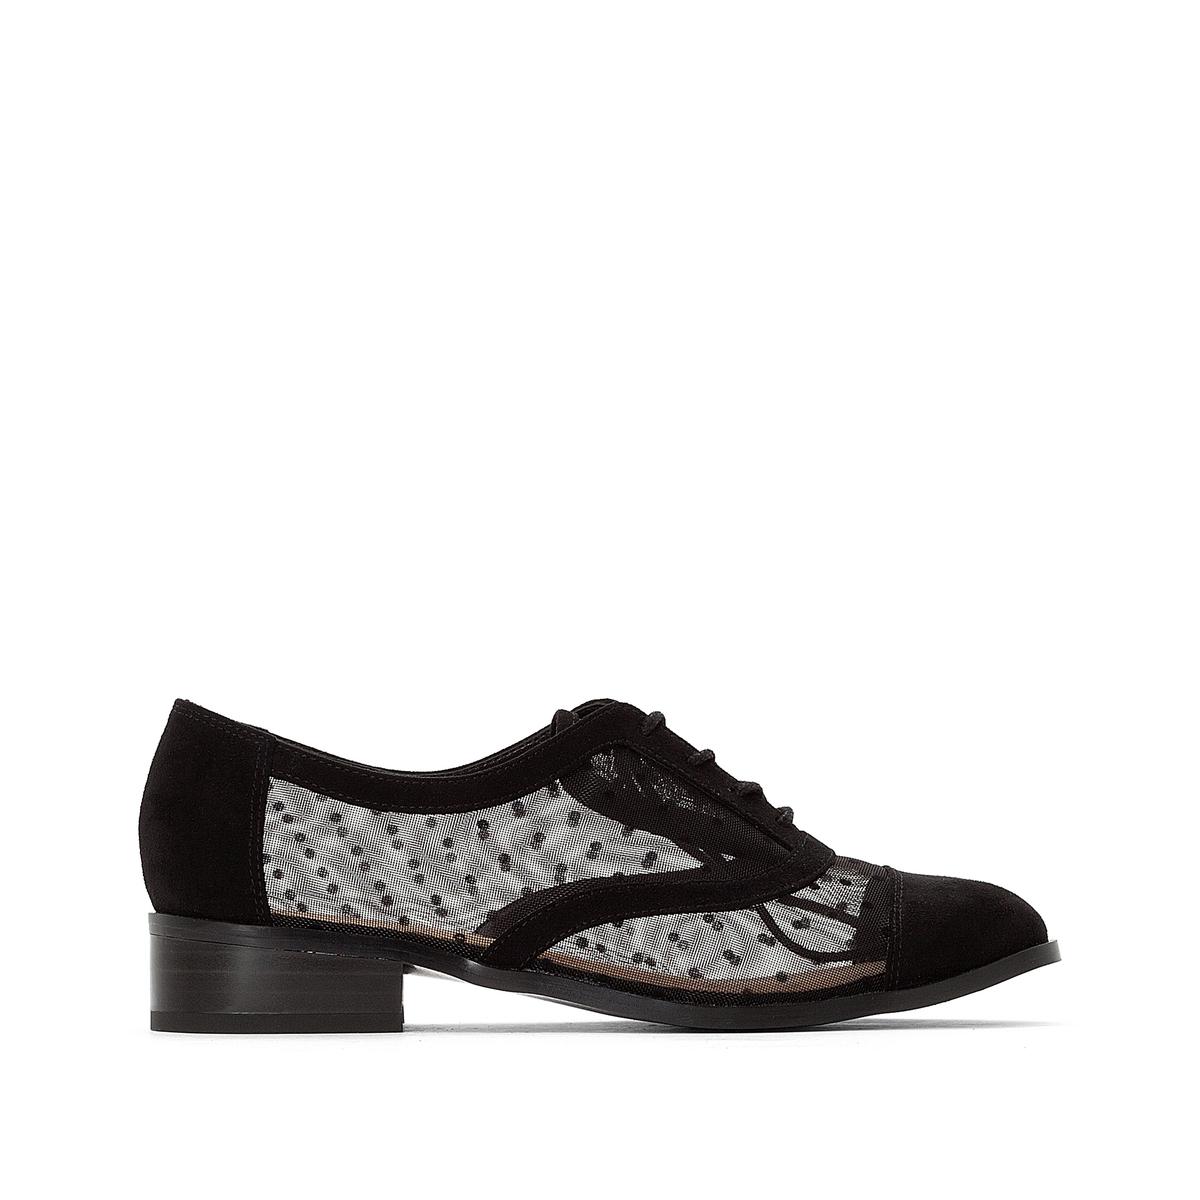 цена Ботинки-дерби La Redoute Из двух материалов на шнуровке на плоской подошве 36 черный онлайн в 2017 году